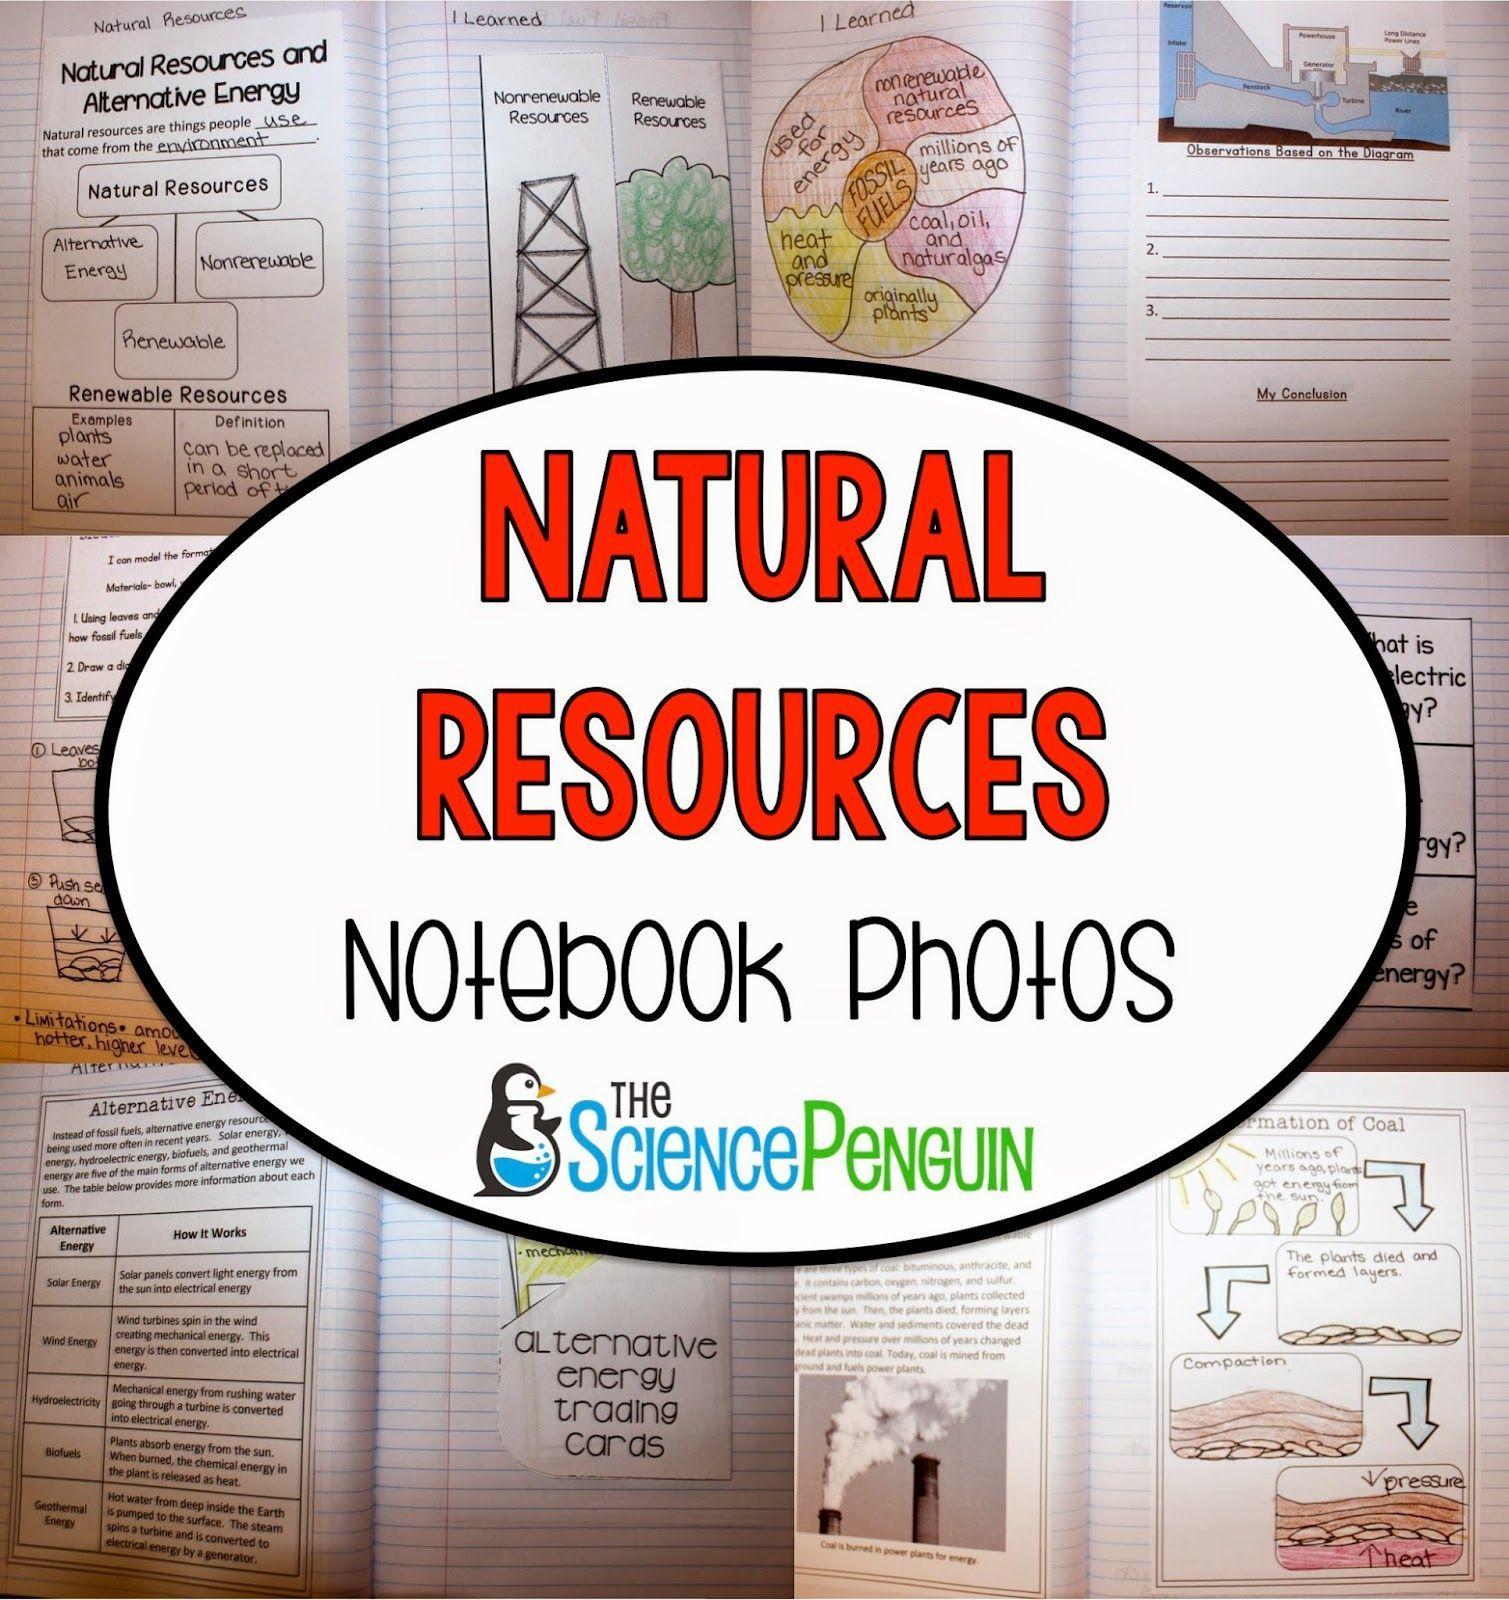 Natural Resources Notebook Photos